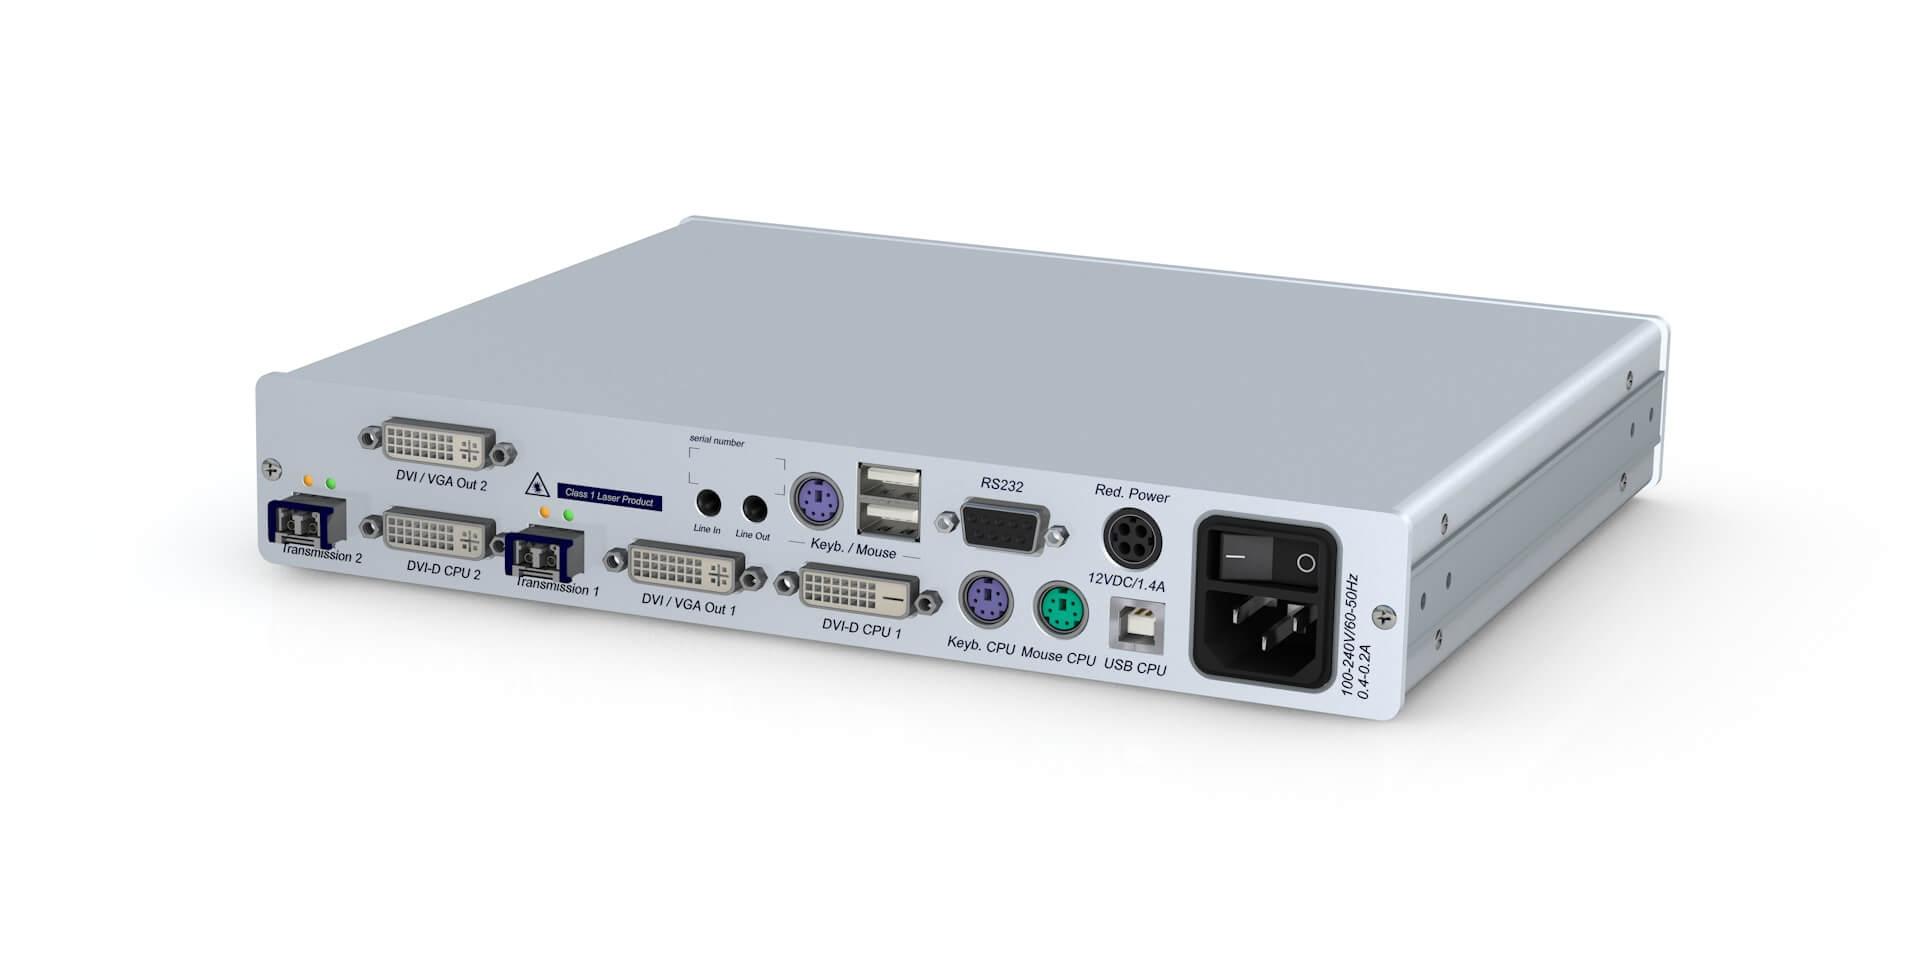 GDSys DVI-Vision Fiber MM MC2-ARU Extender - Receiver Con - Single Rx 2xDVI-SL PS/2-USB Audio RS232 USB 2.0 Full Speed Desktop